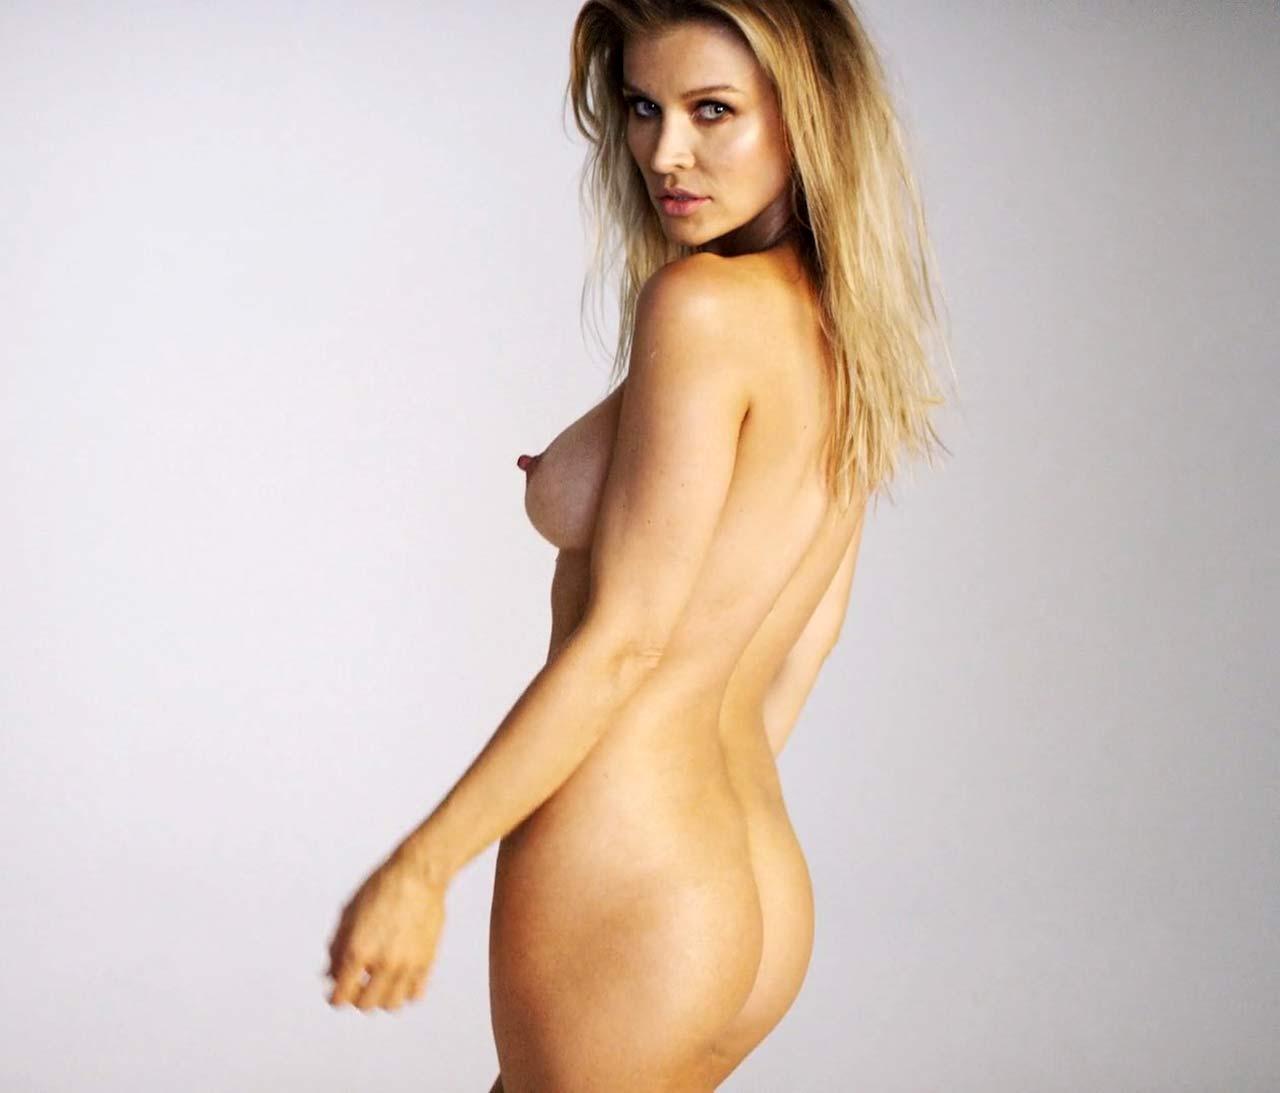 from-models-joanna-krupa-nude-tits